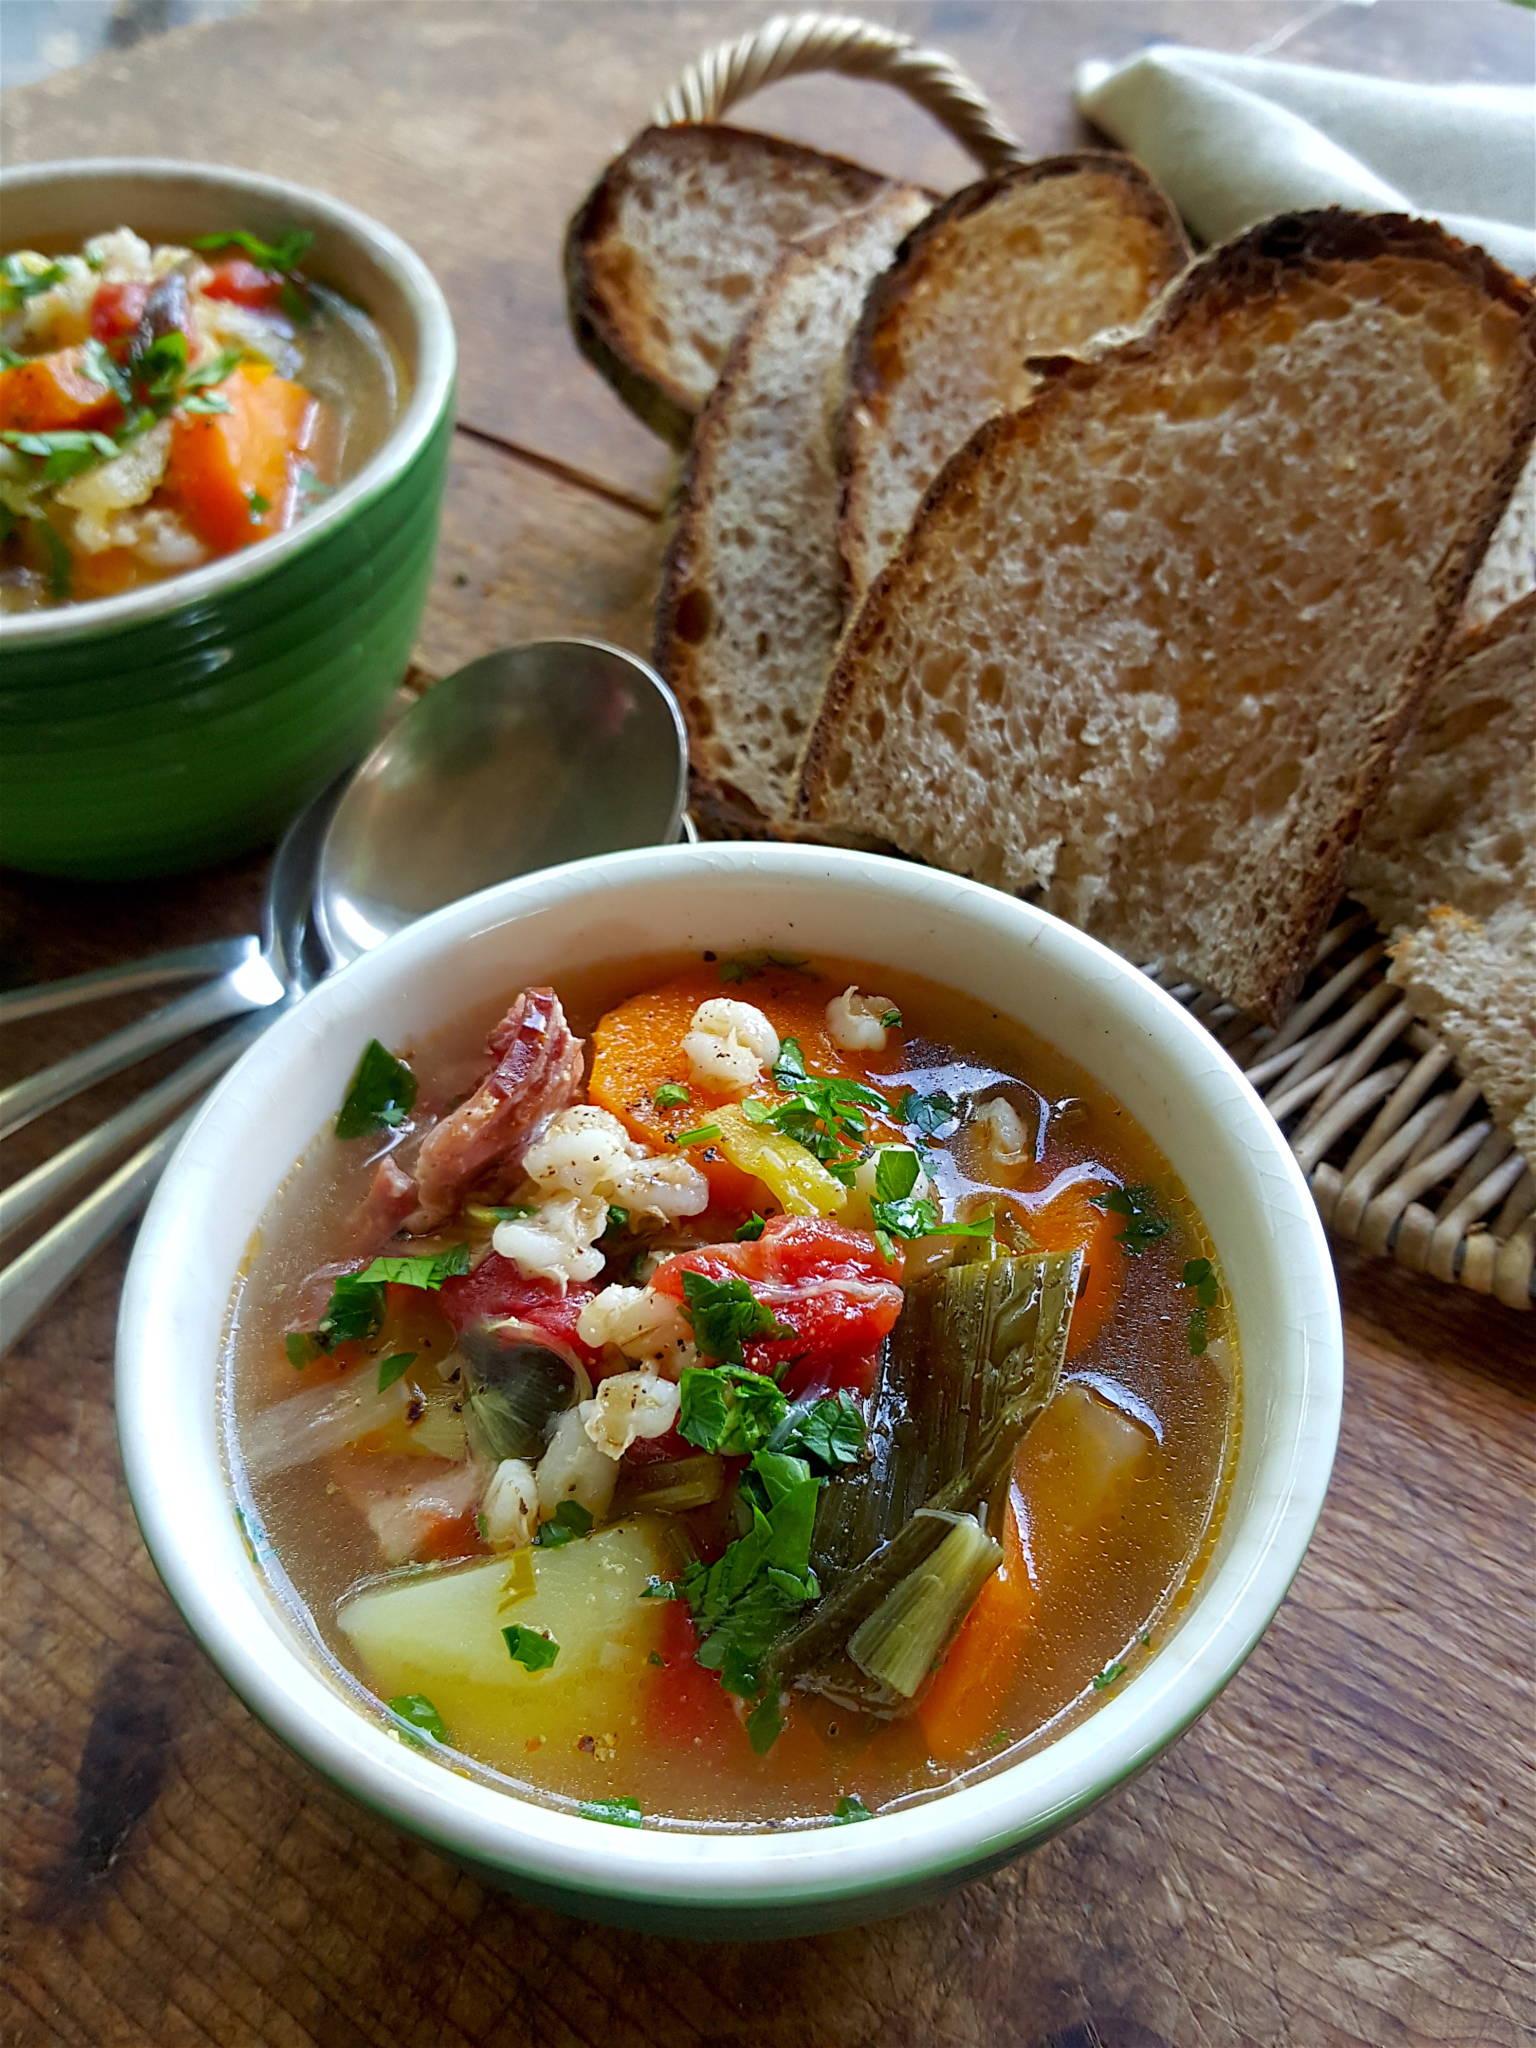 Good-for-you Vege & barley soup